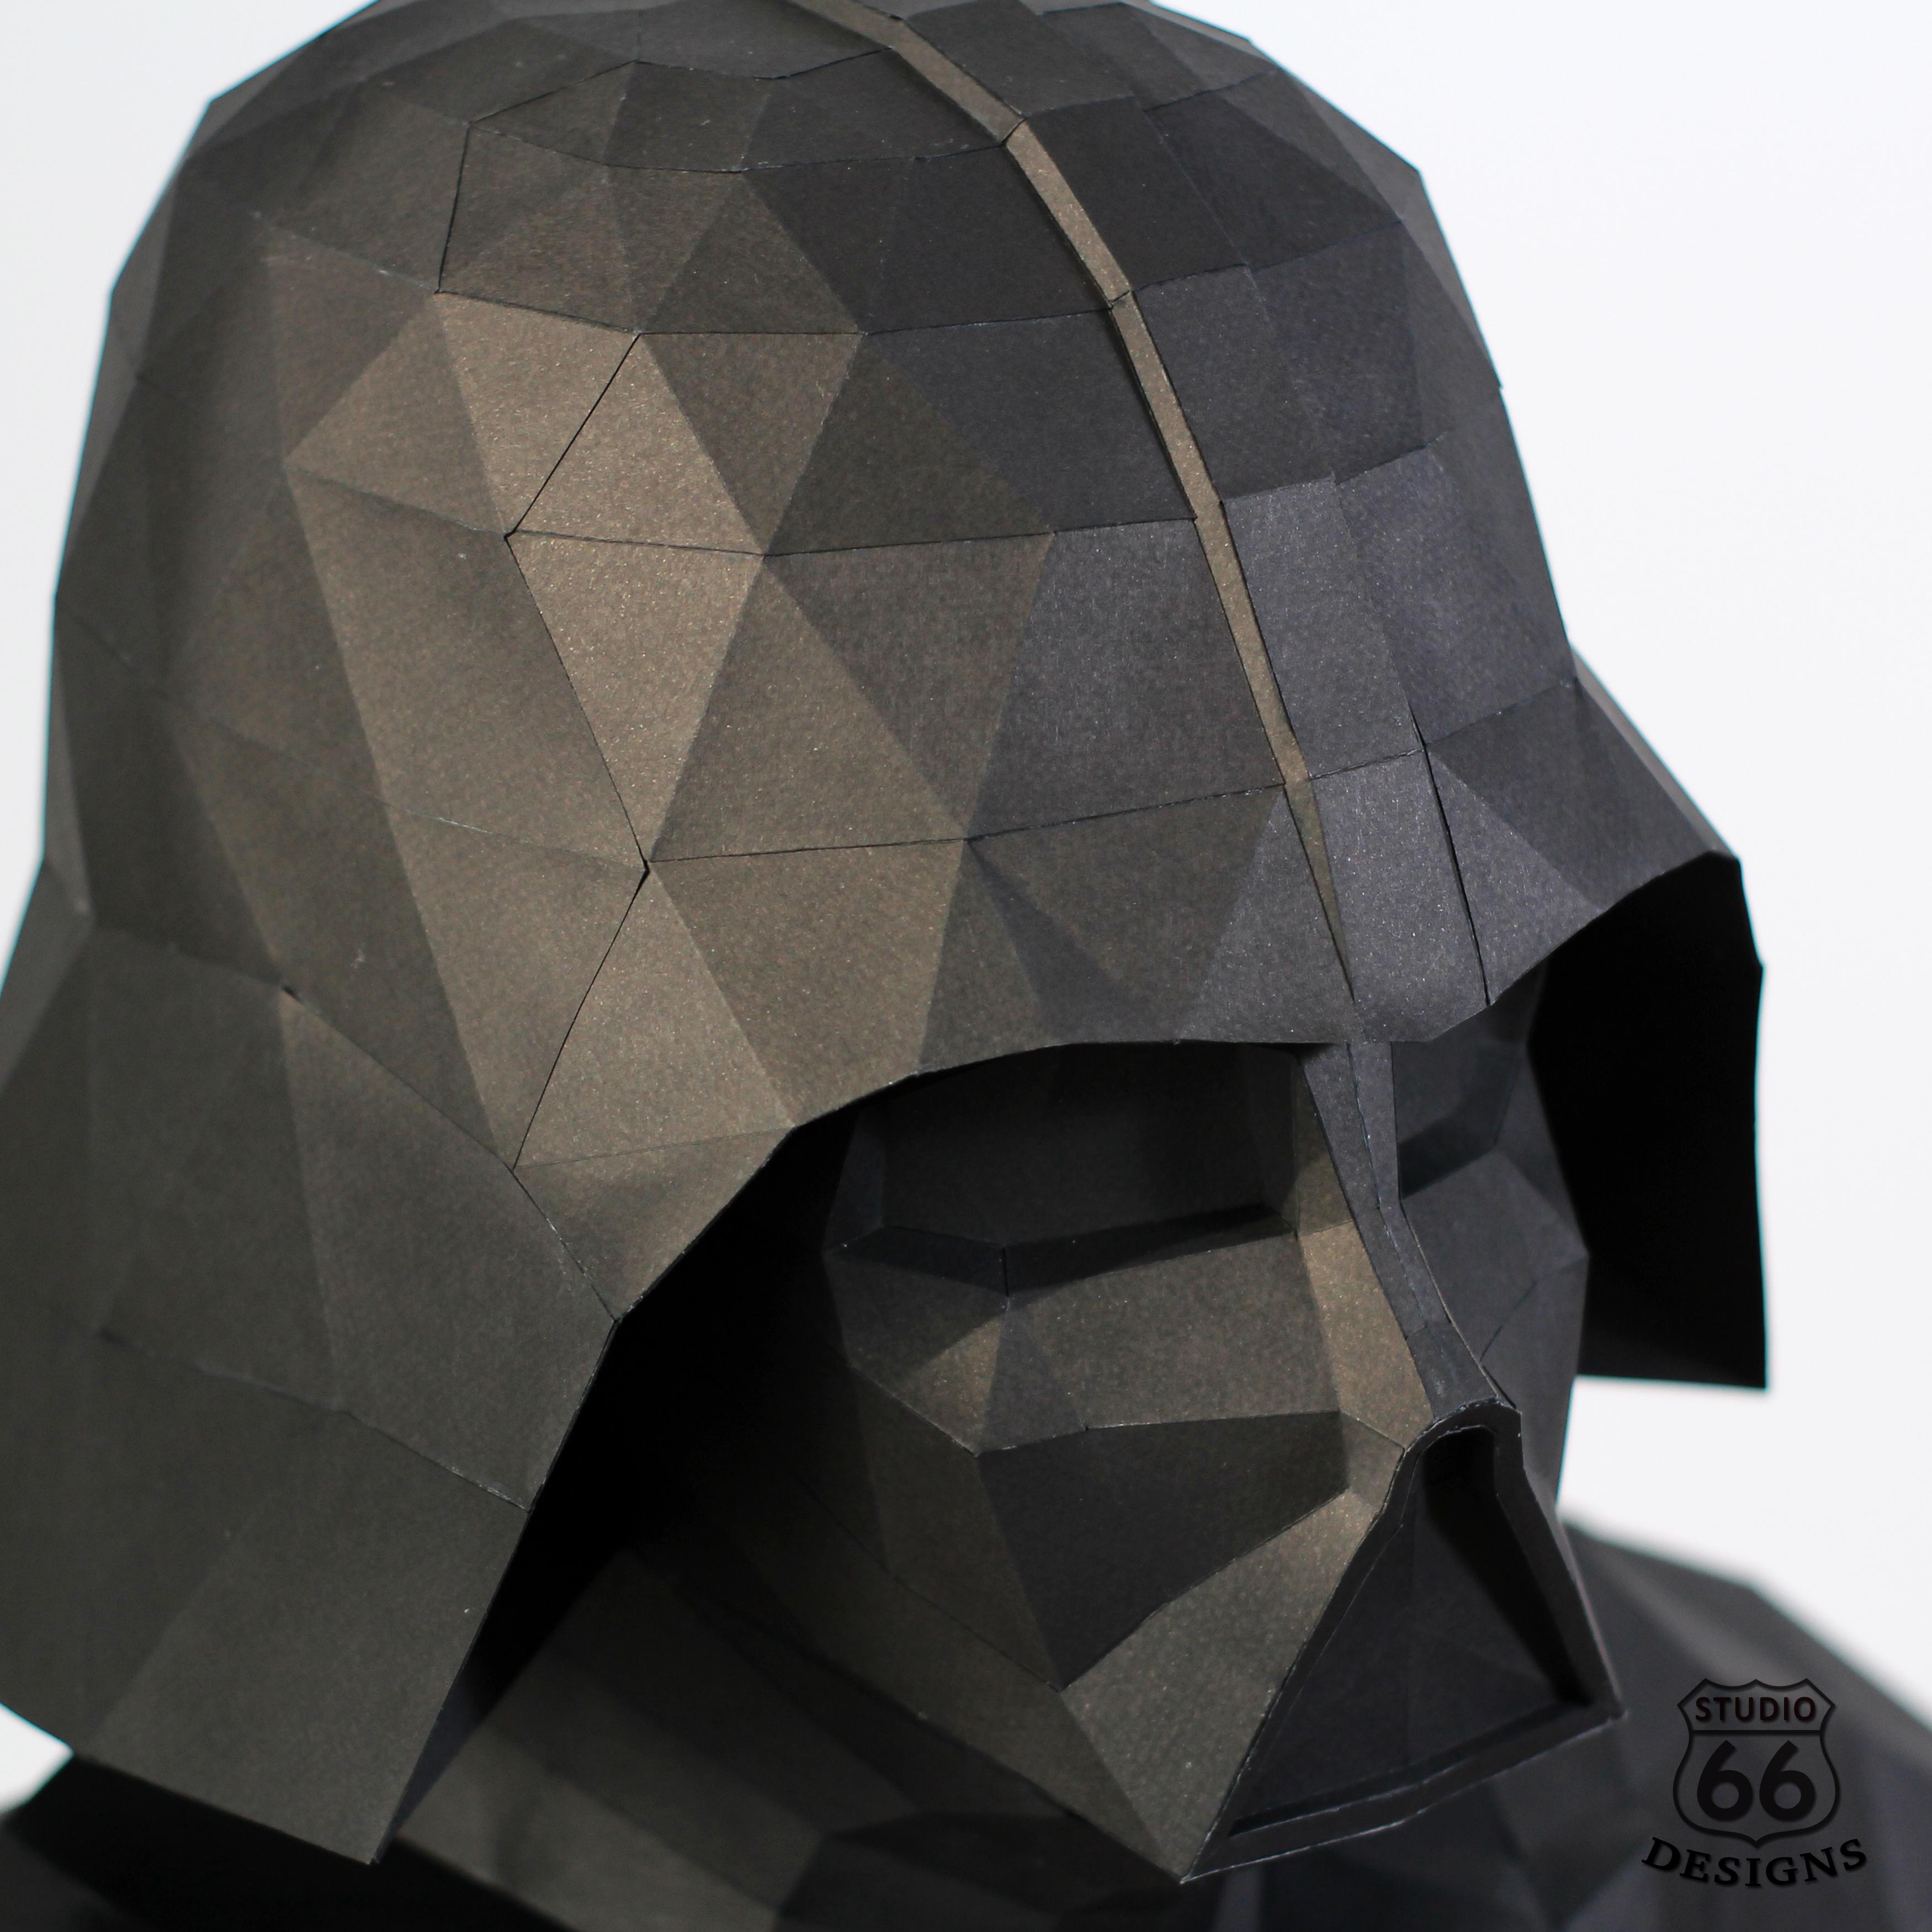 Darth Vader Helmet Cardboard Template American Bathtub Refinishers